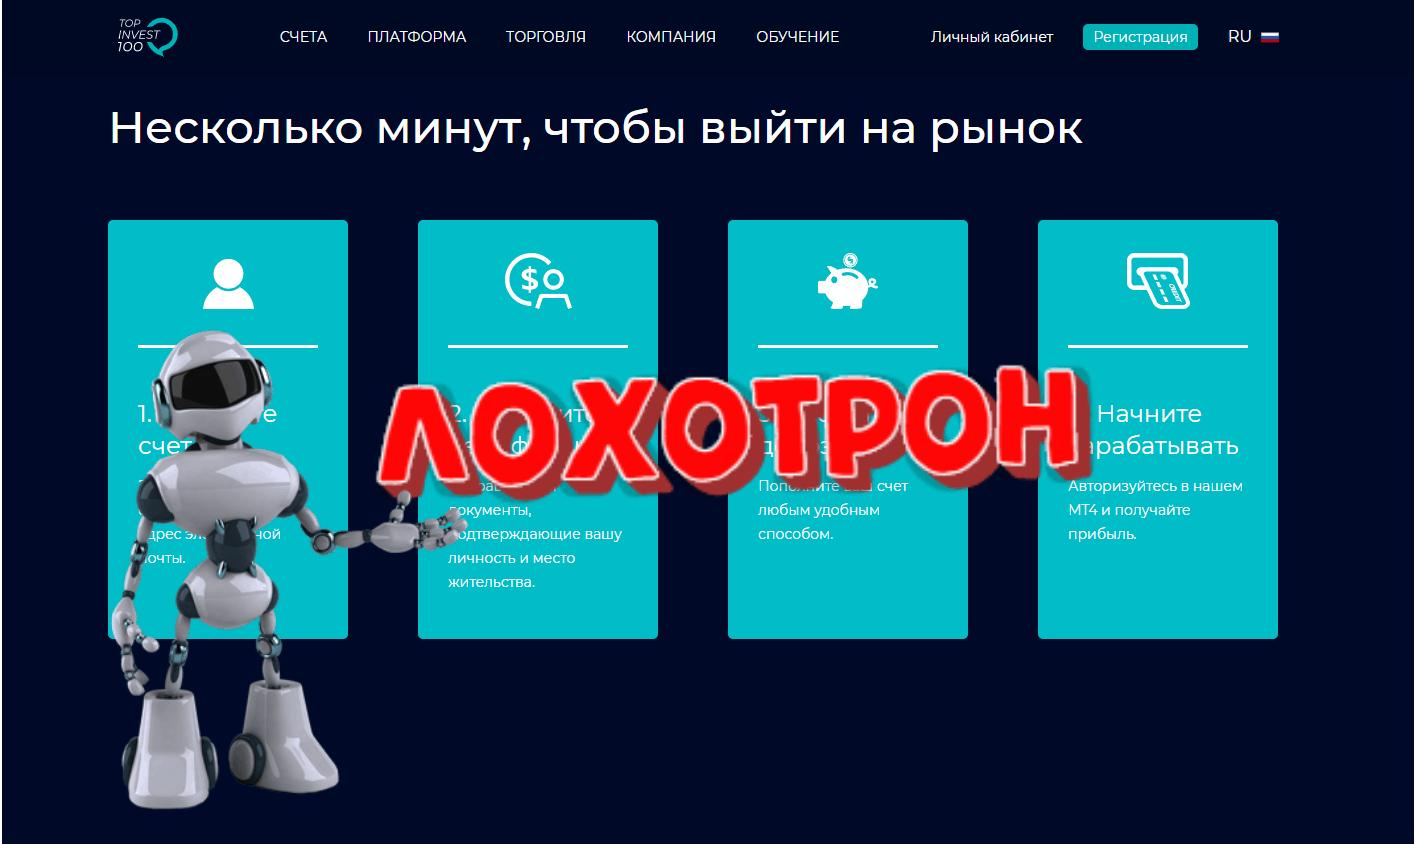 Top Invest 100 - отзывы и обзор. Topinvest100.com развод?